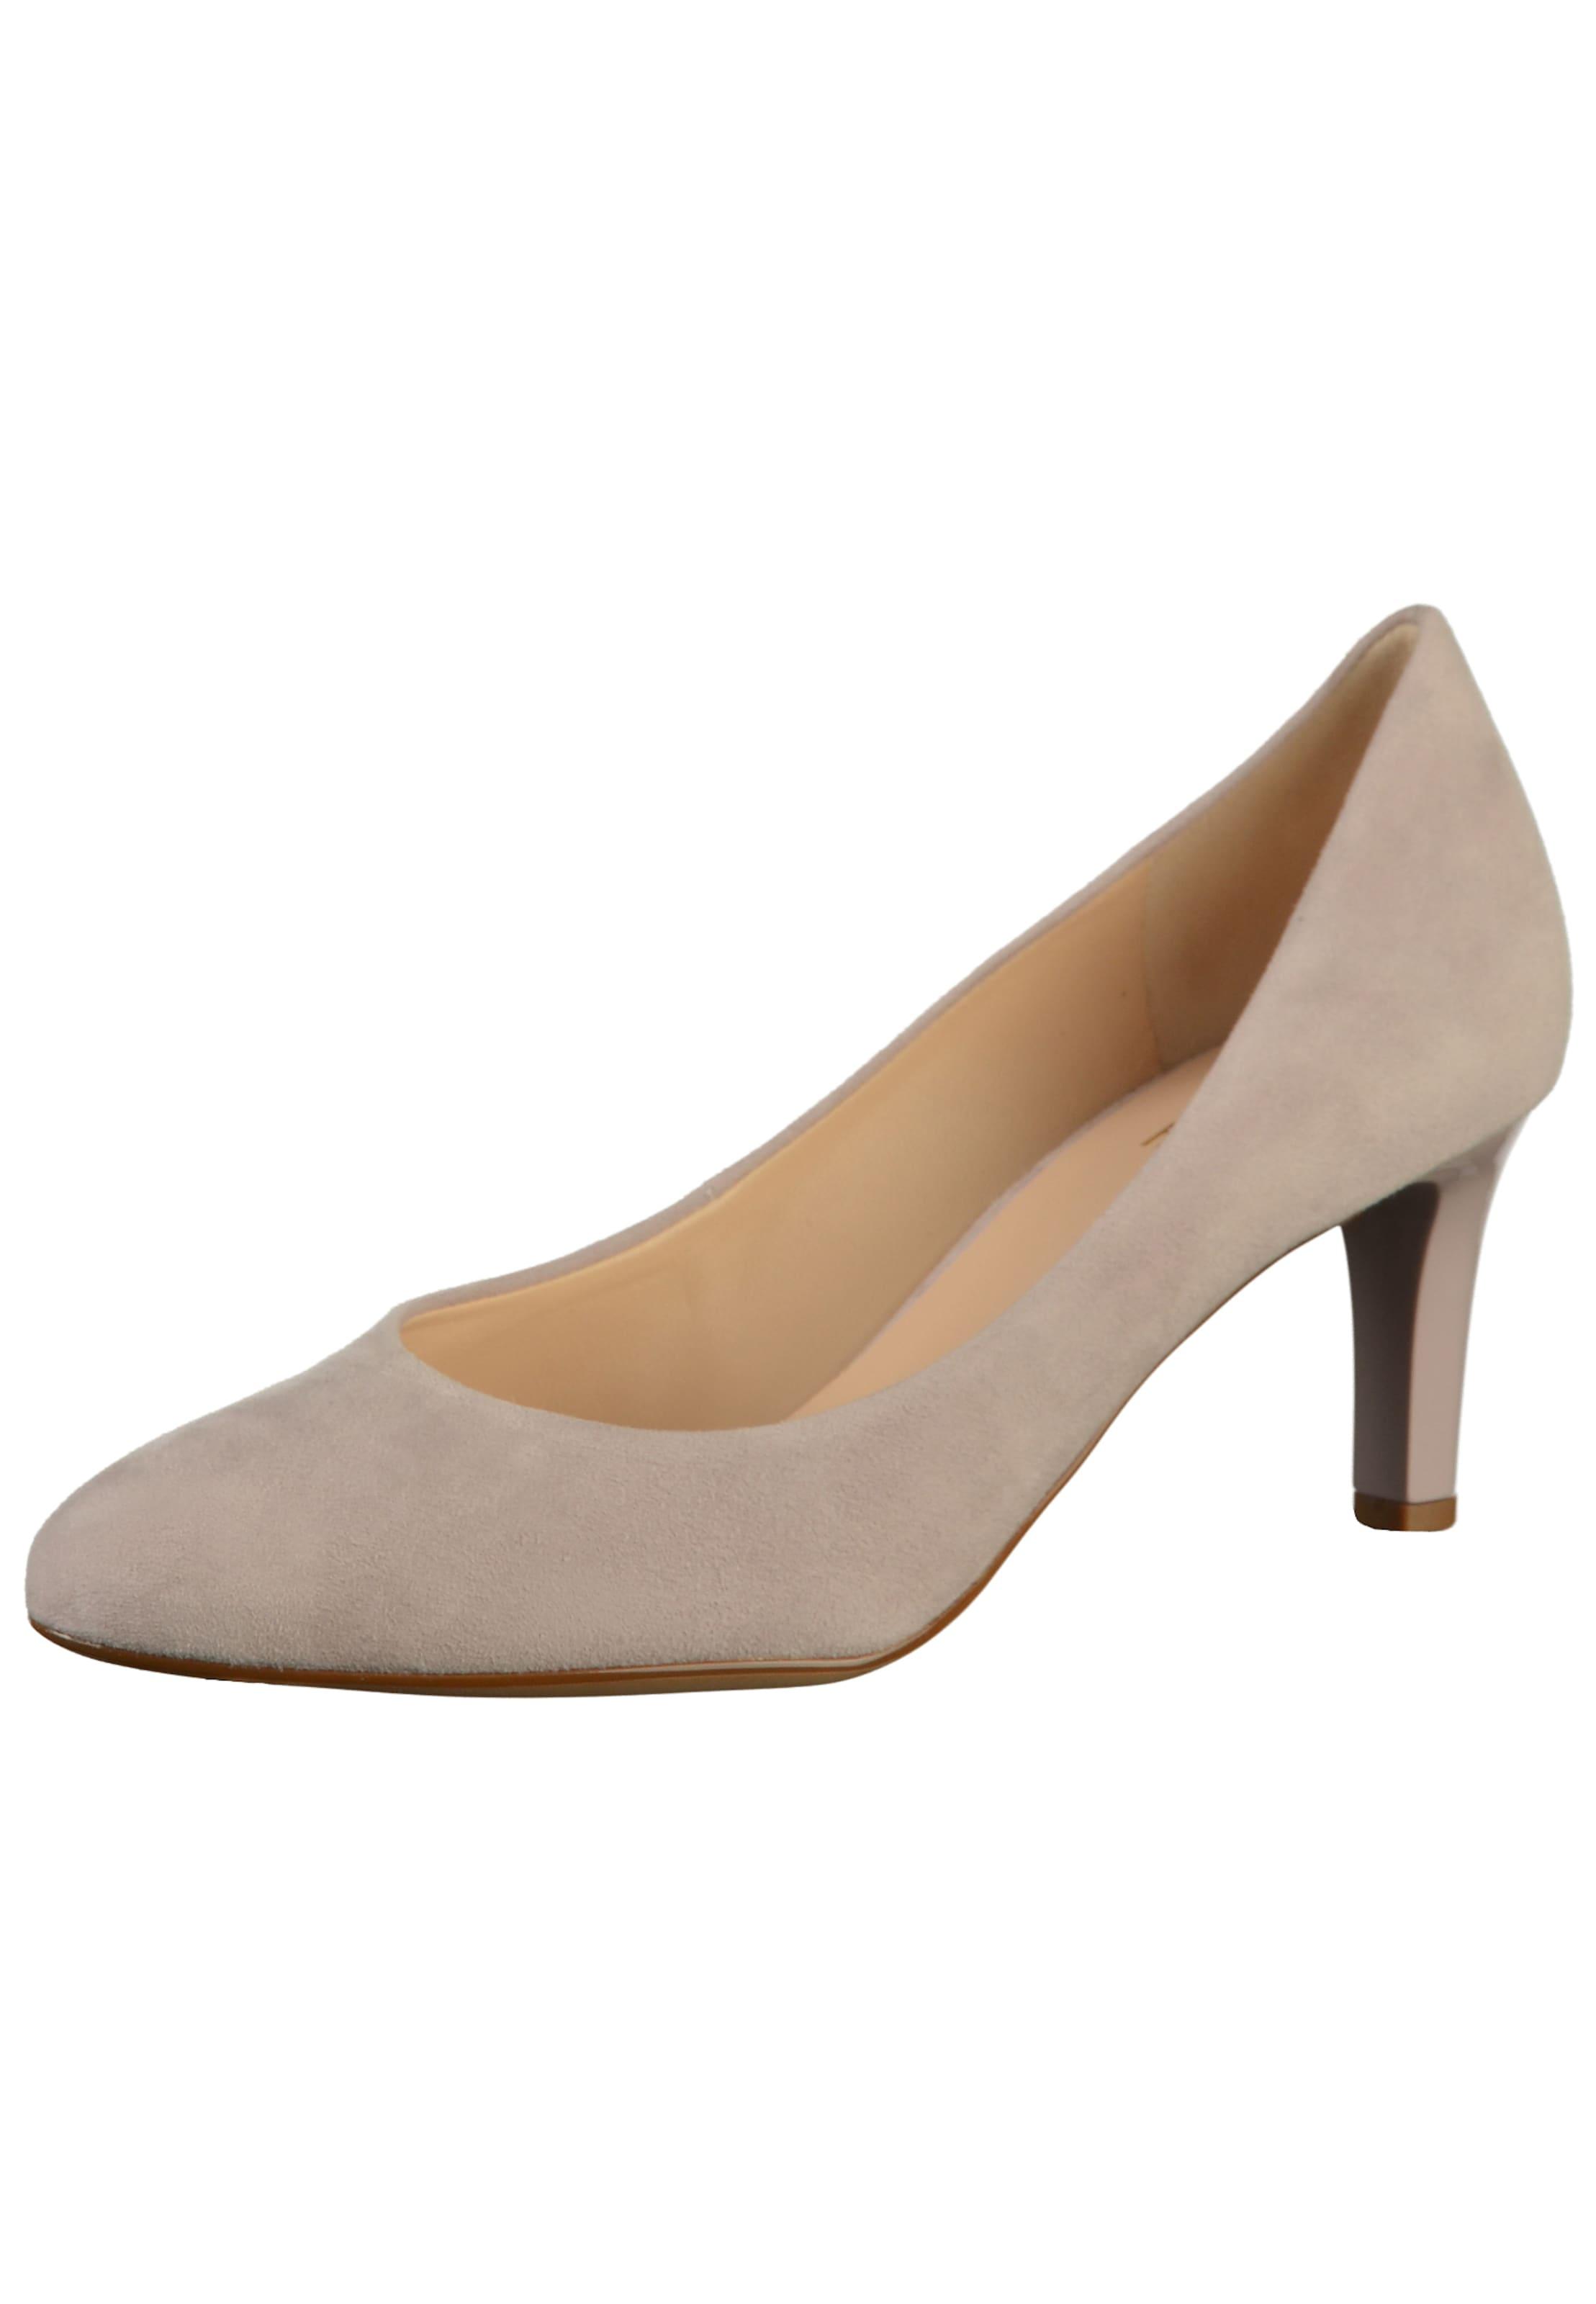 Högl Pumps Verschleißfeste billige Schuhe Hohe Qualität Qualität Hohe 8930d8